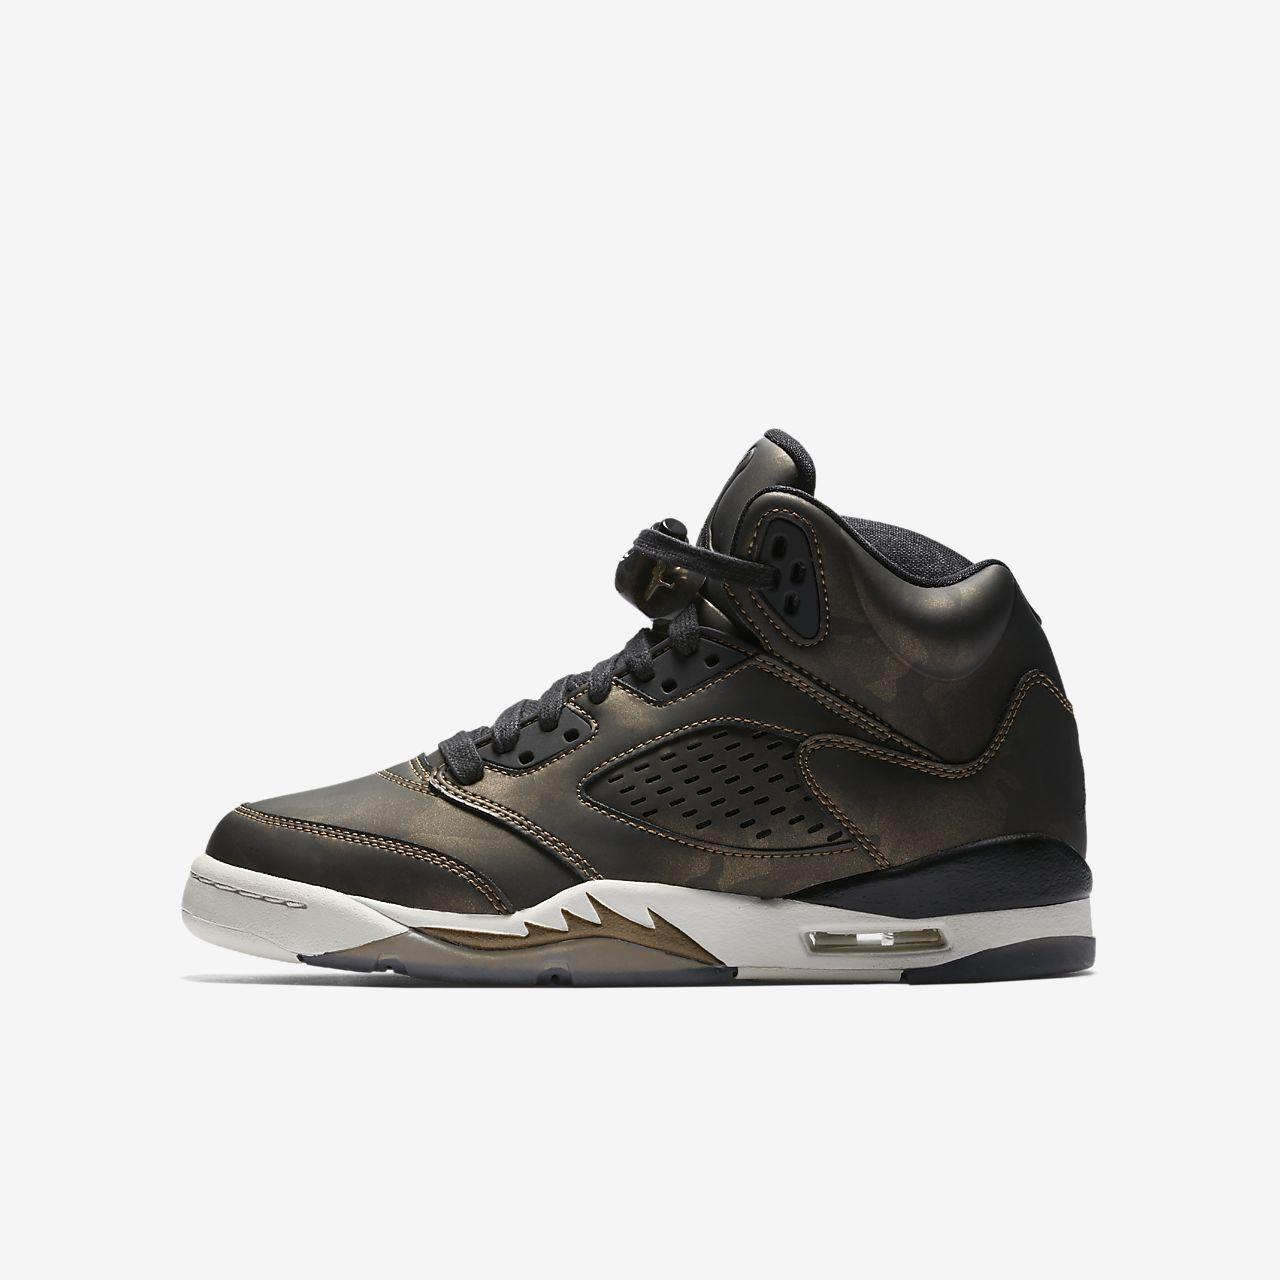 Premium Ragazzi Retro Collection Air 5 Nike Scarpa Jordan Heiress q0PIn6w